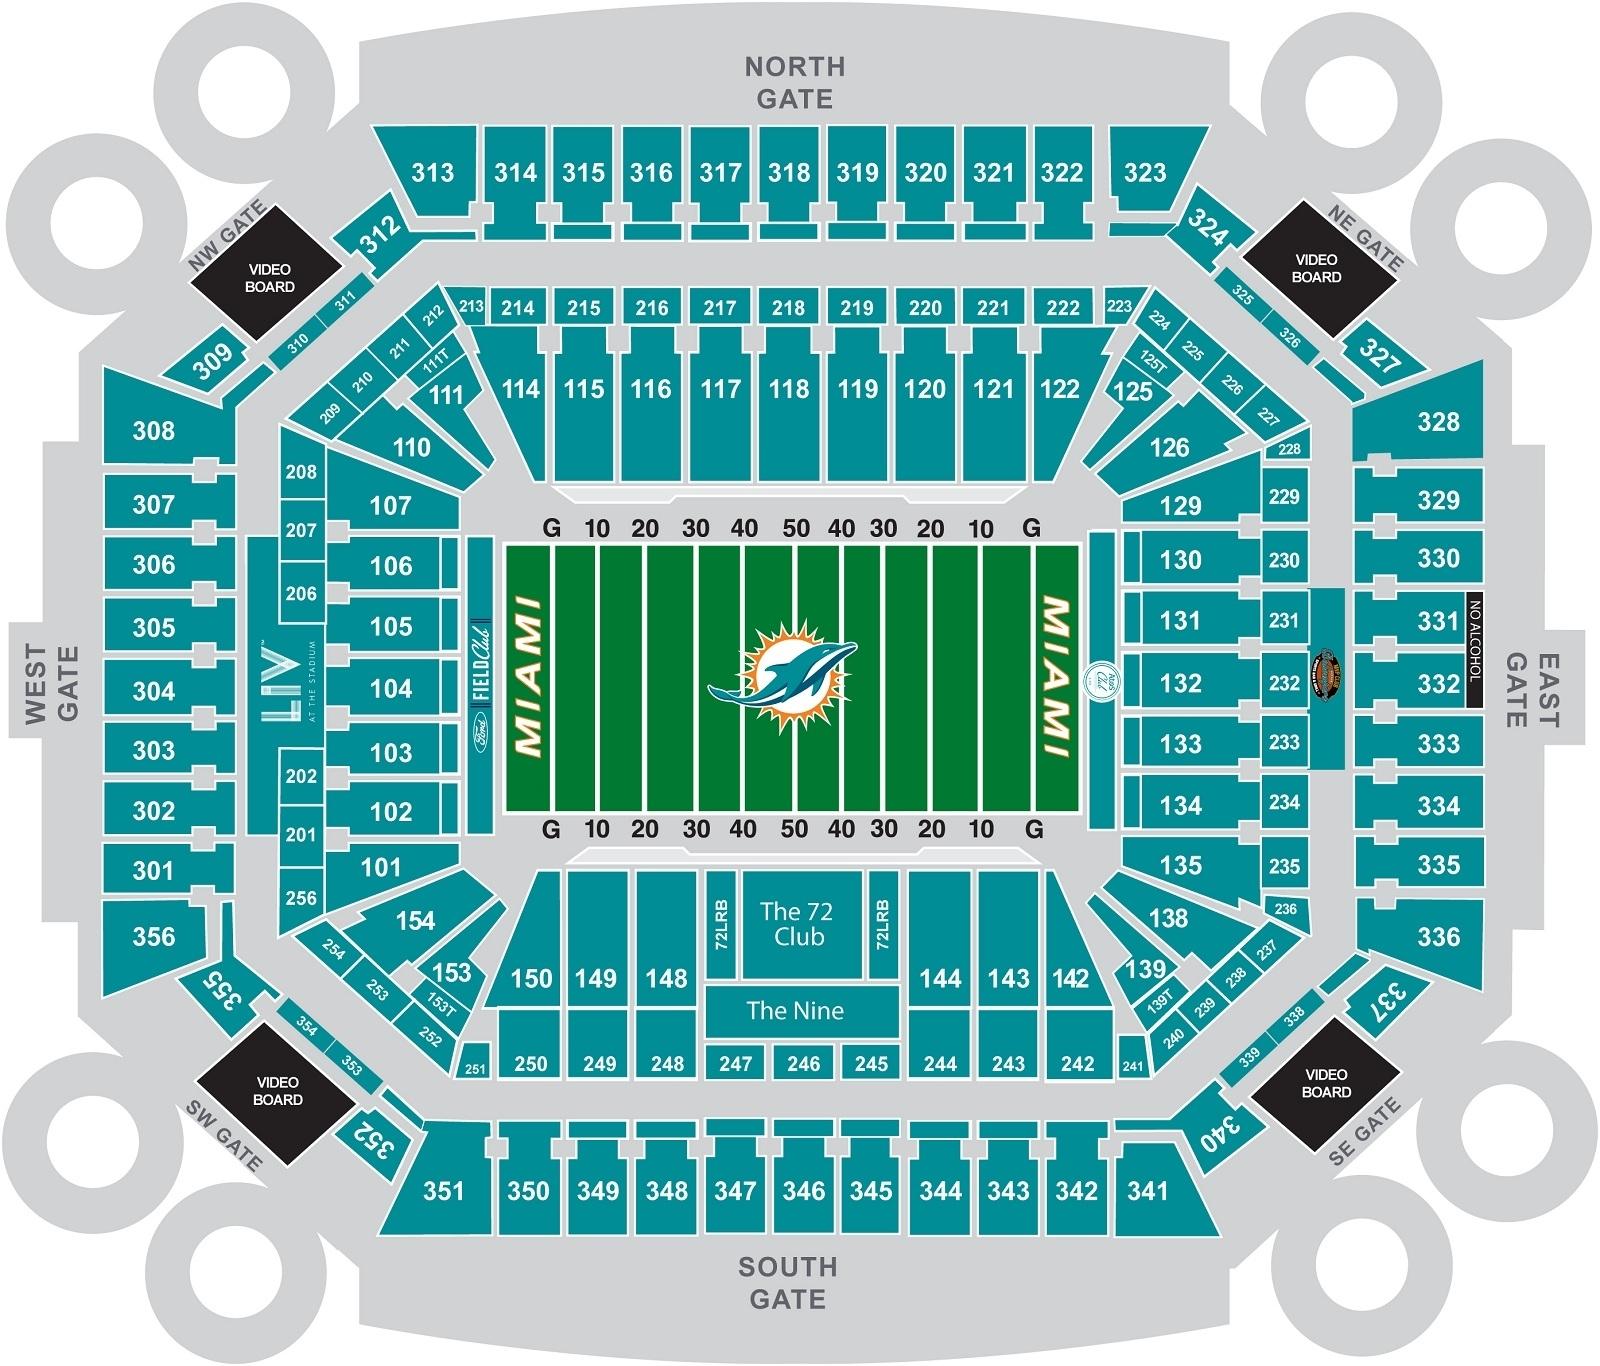 2020 Super Bowl Seating Chart | February 2, 2020 | Fan pertaining to Super Bowl Tickets Seating Chart